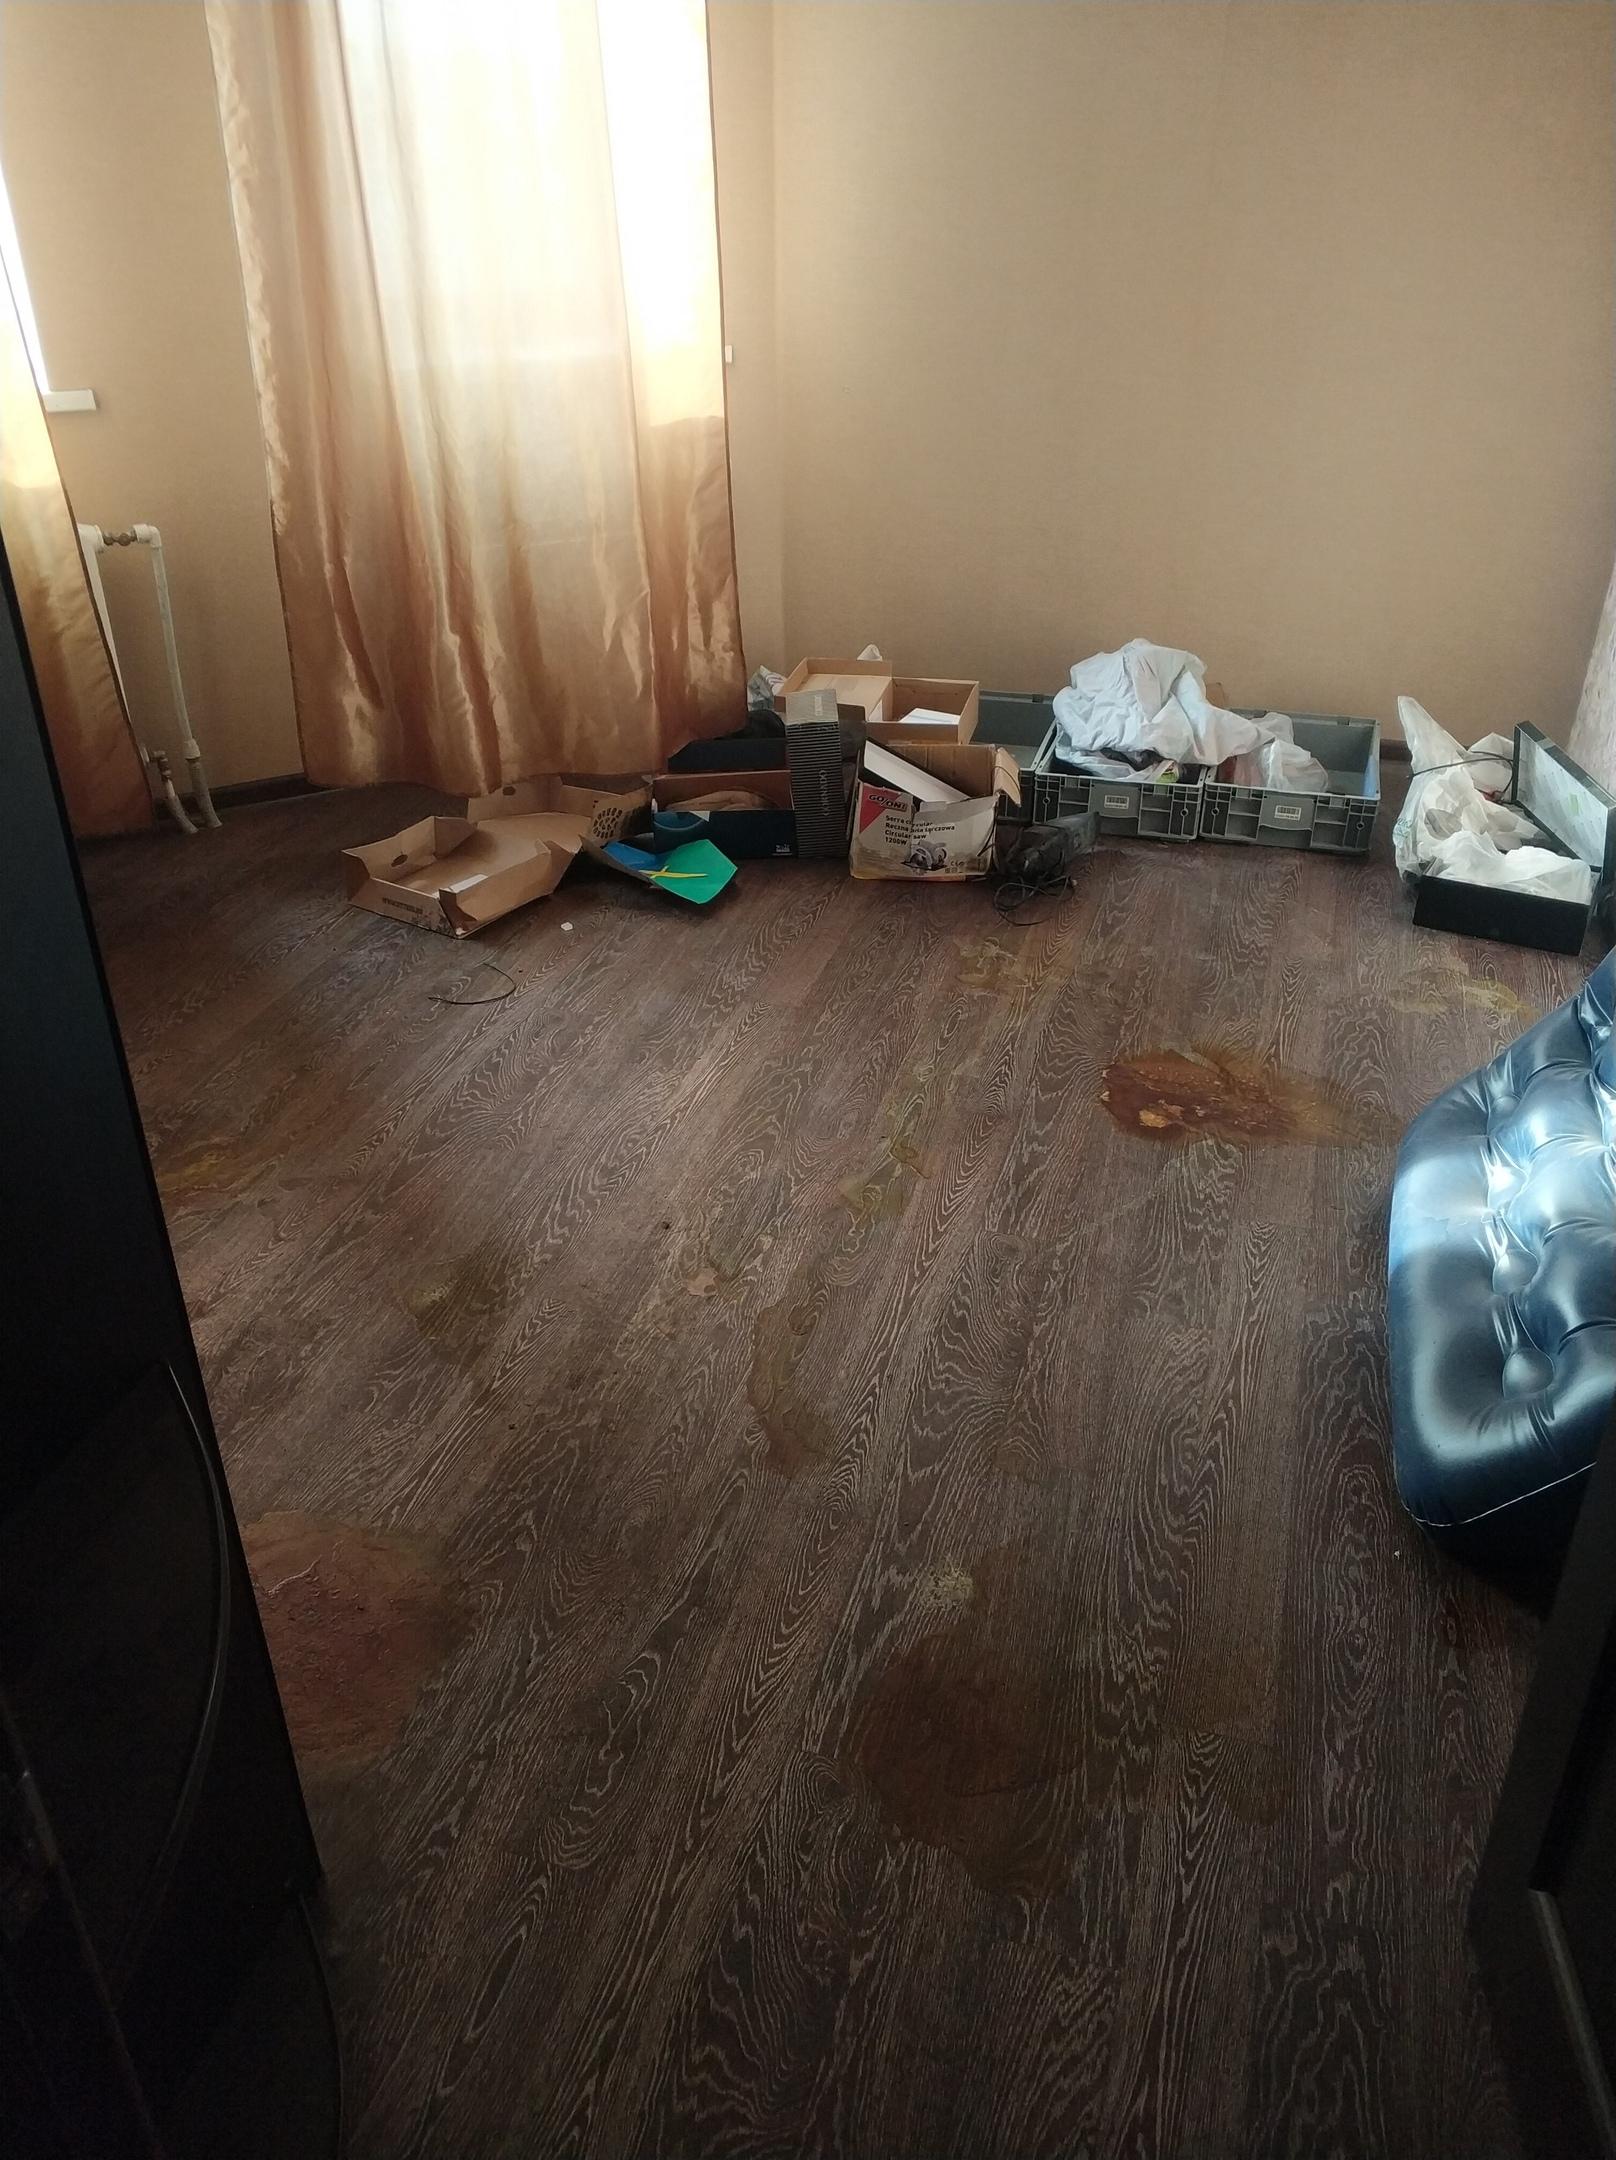 уборка после квартирантов